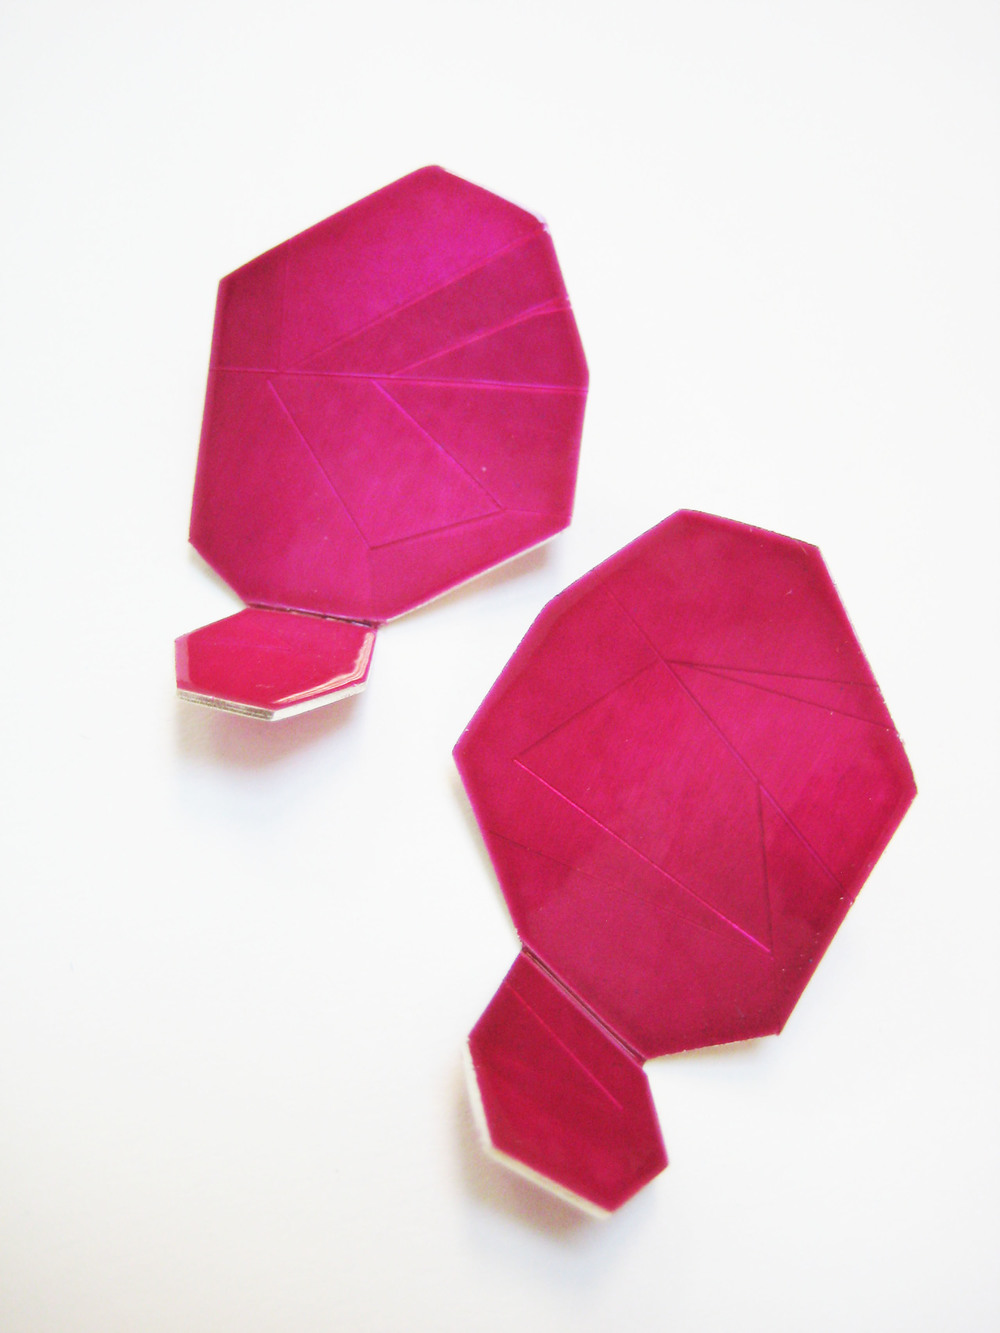 3-Large Raspberry Ear Gems-Voegele.jpg